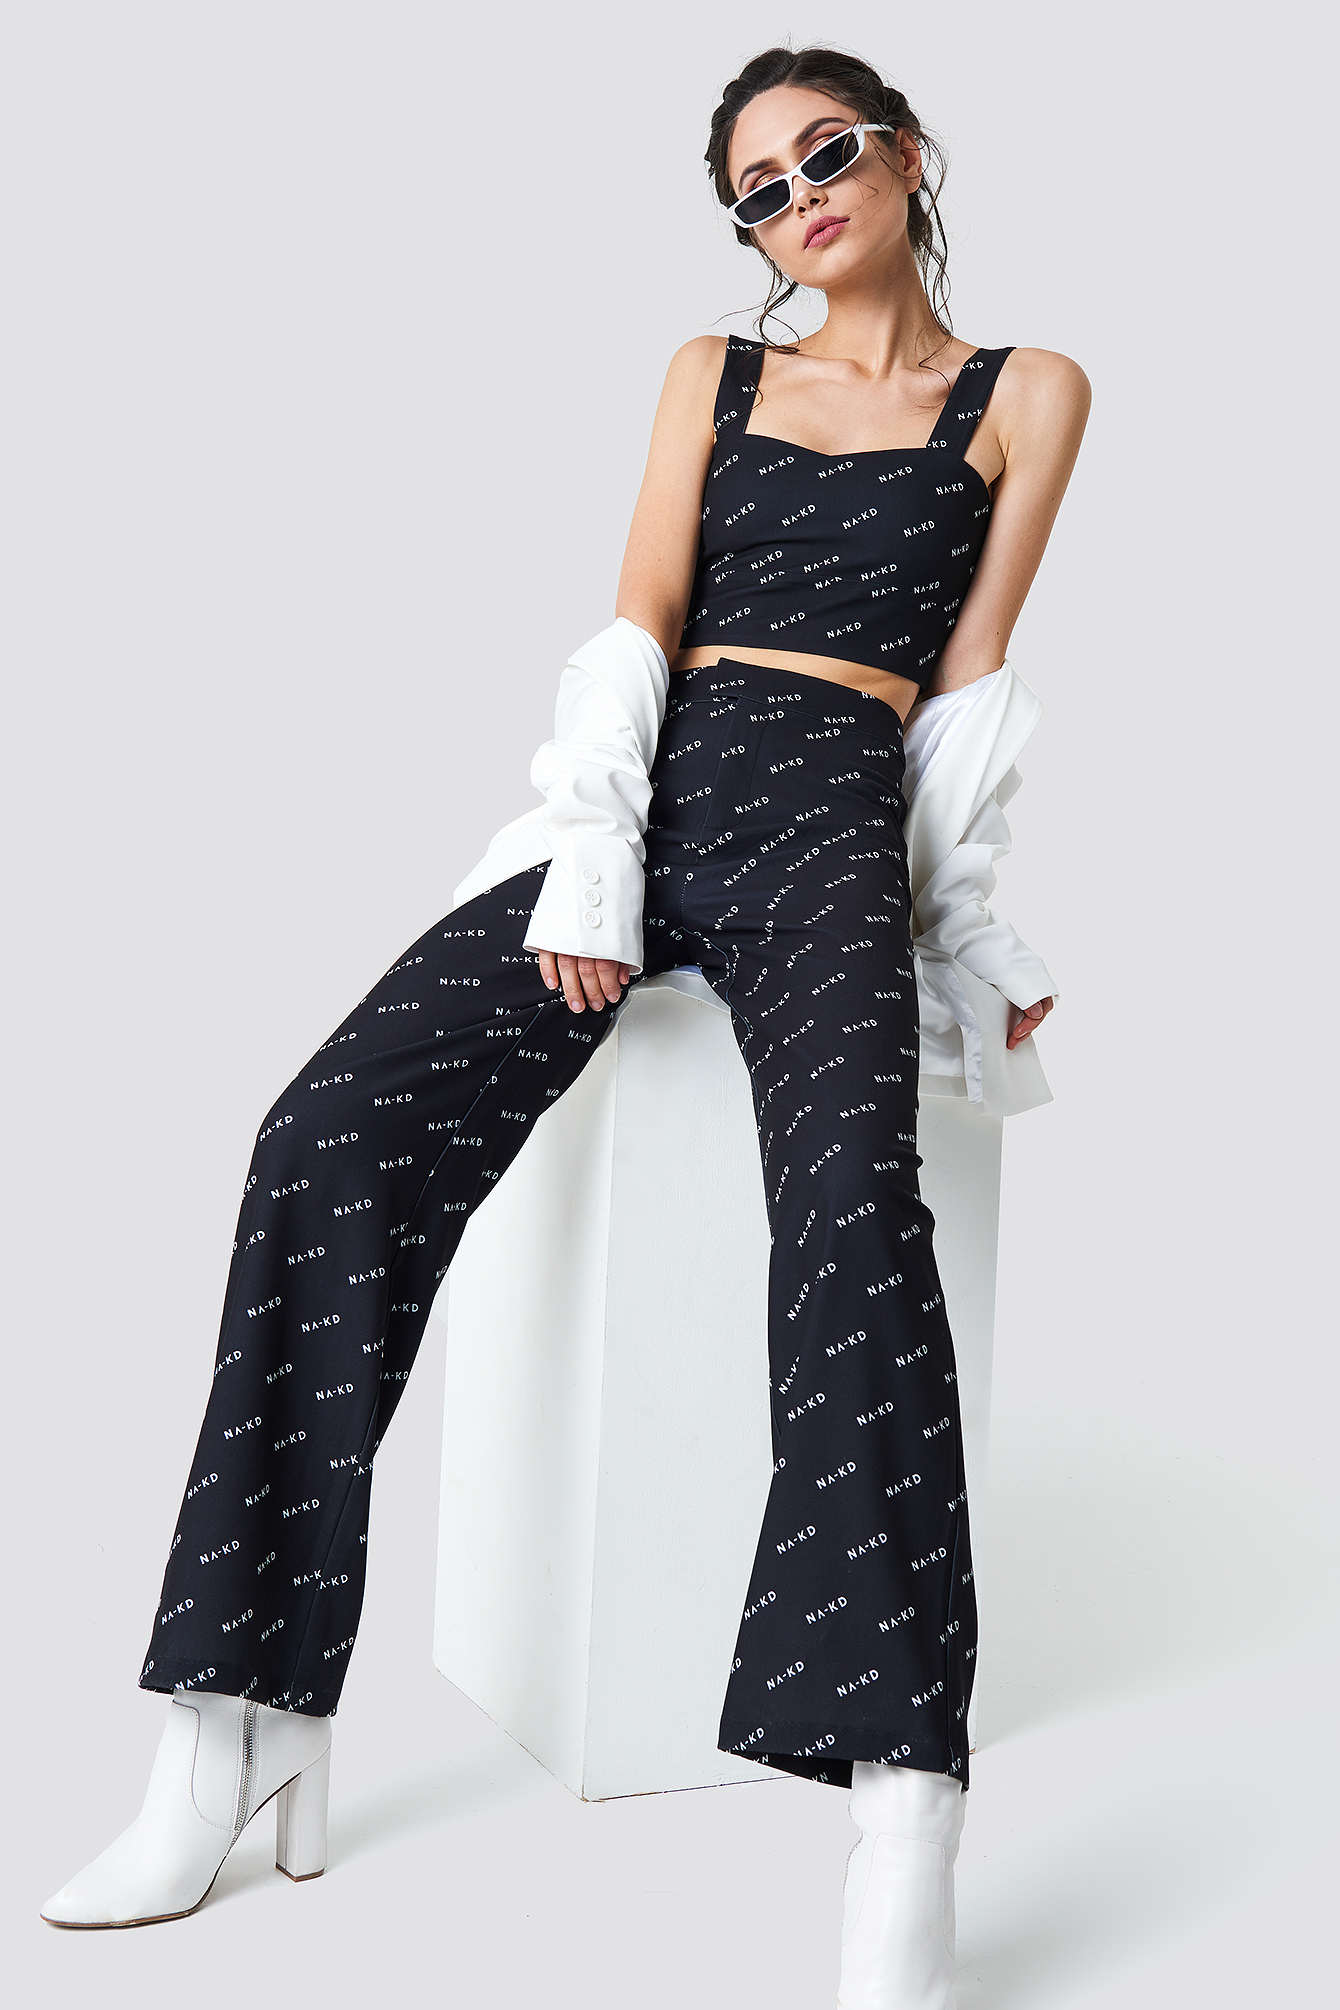 NA-KD LOGO LOOSE FIT PANTS - BLACK